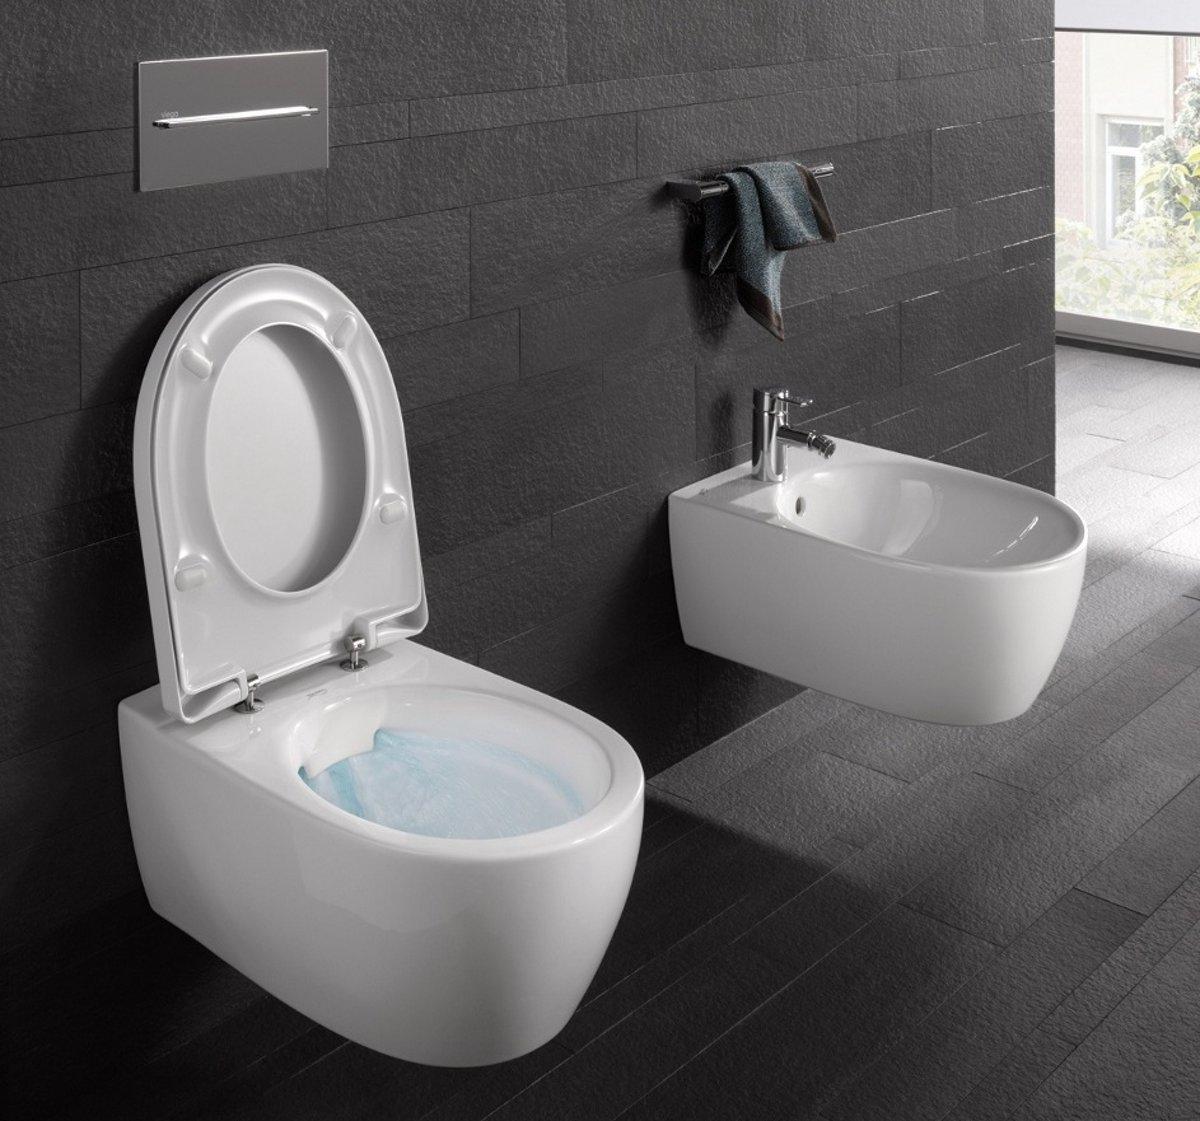 Excellent Bol Com Keramag Icon Rimfree Toilet 53Cm Diep Unemploymentrelief Wooden Chair Designs For Living Room Unemploymentrelieforg